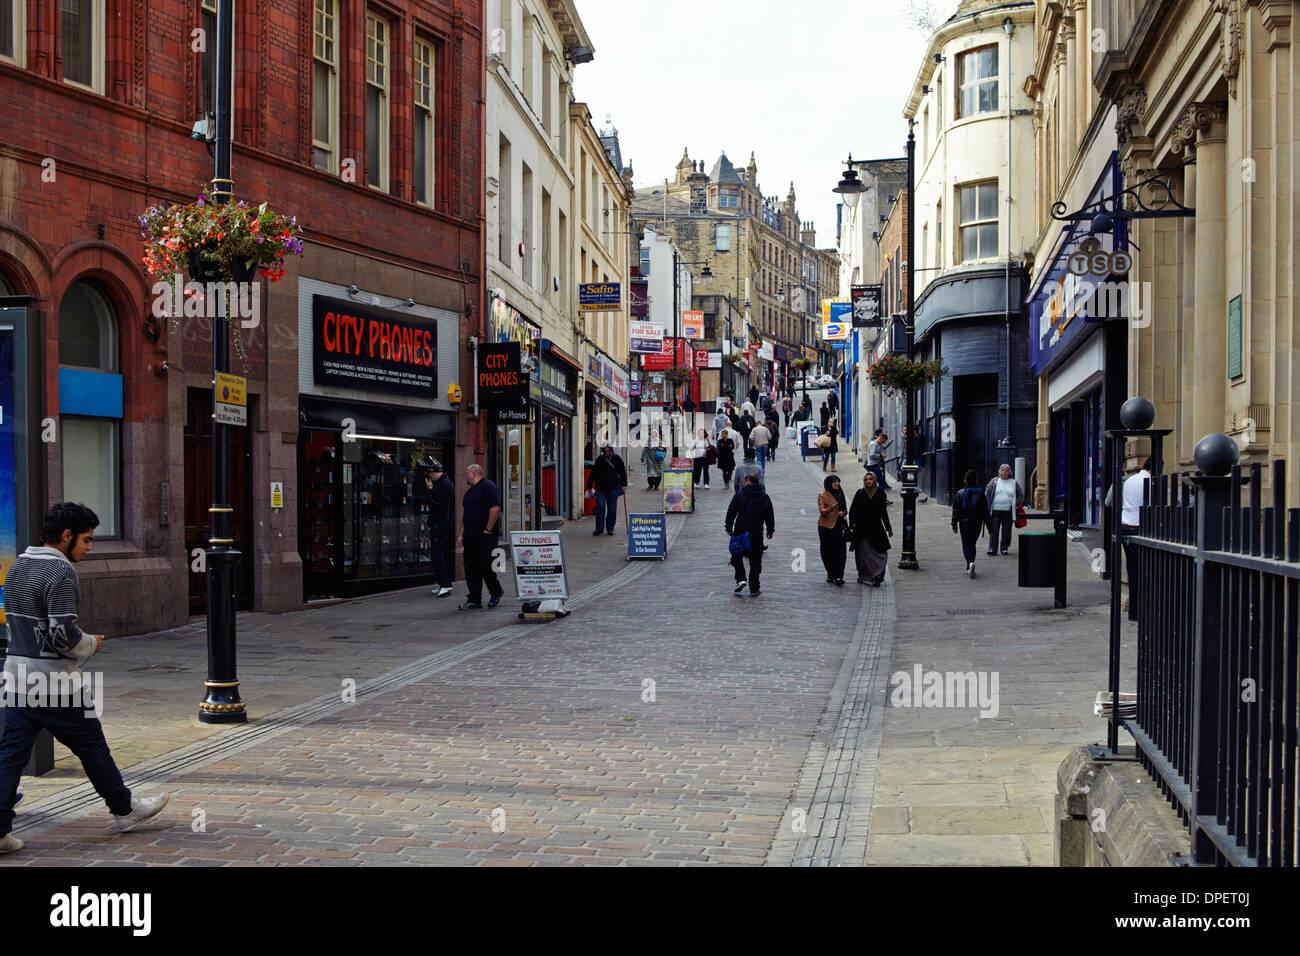 Bradford, Yorkshire shopping centre street - Stock Image